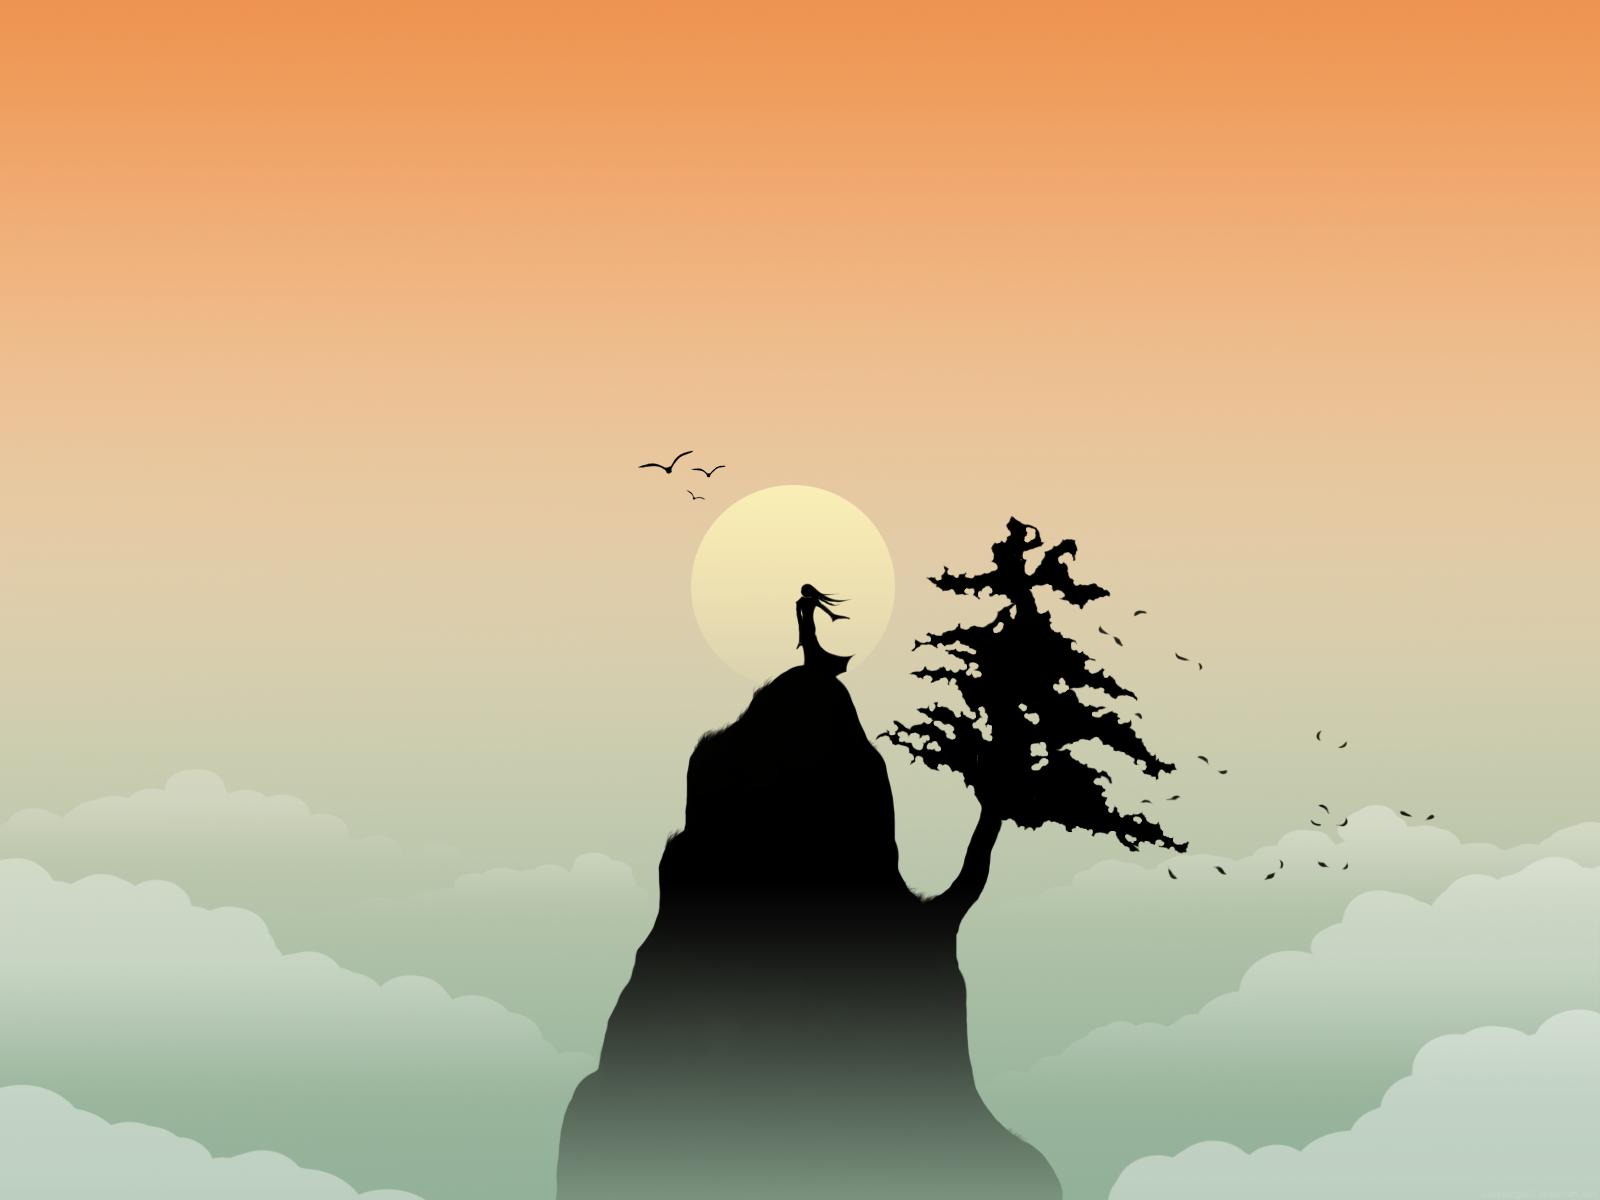 The Wind Sings Of A Journey By Lassekongo83